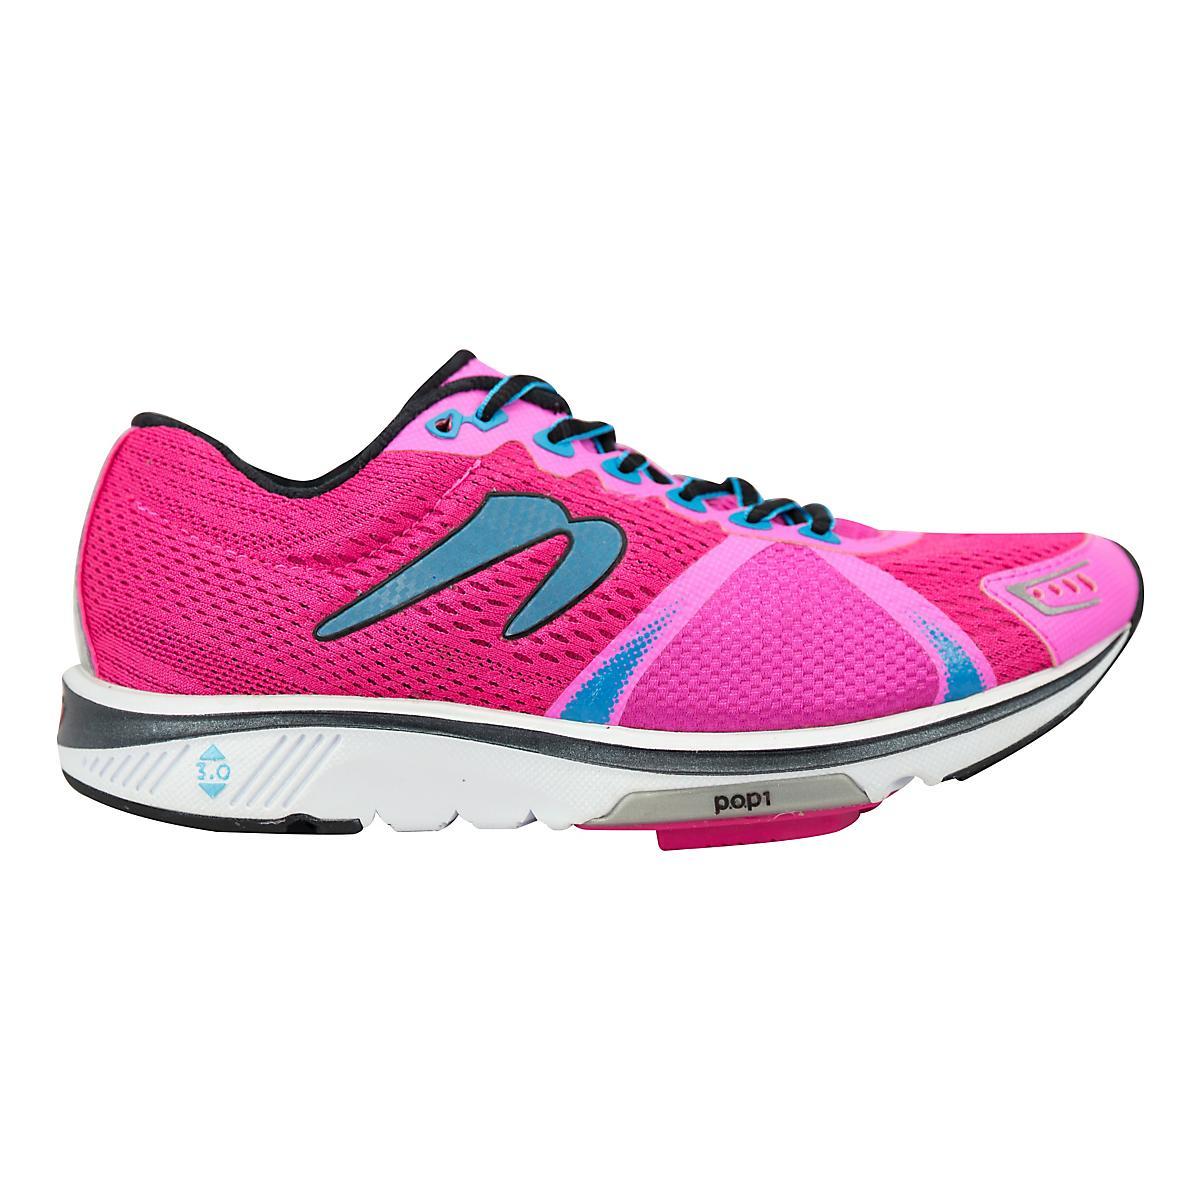 78941d2ead8211 Womens Newton Running Gravity VI Running Shoe at Road Runner Sports